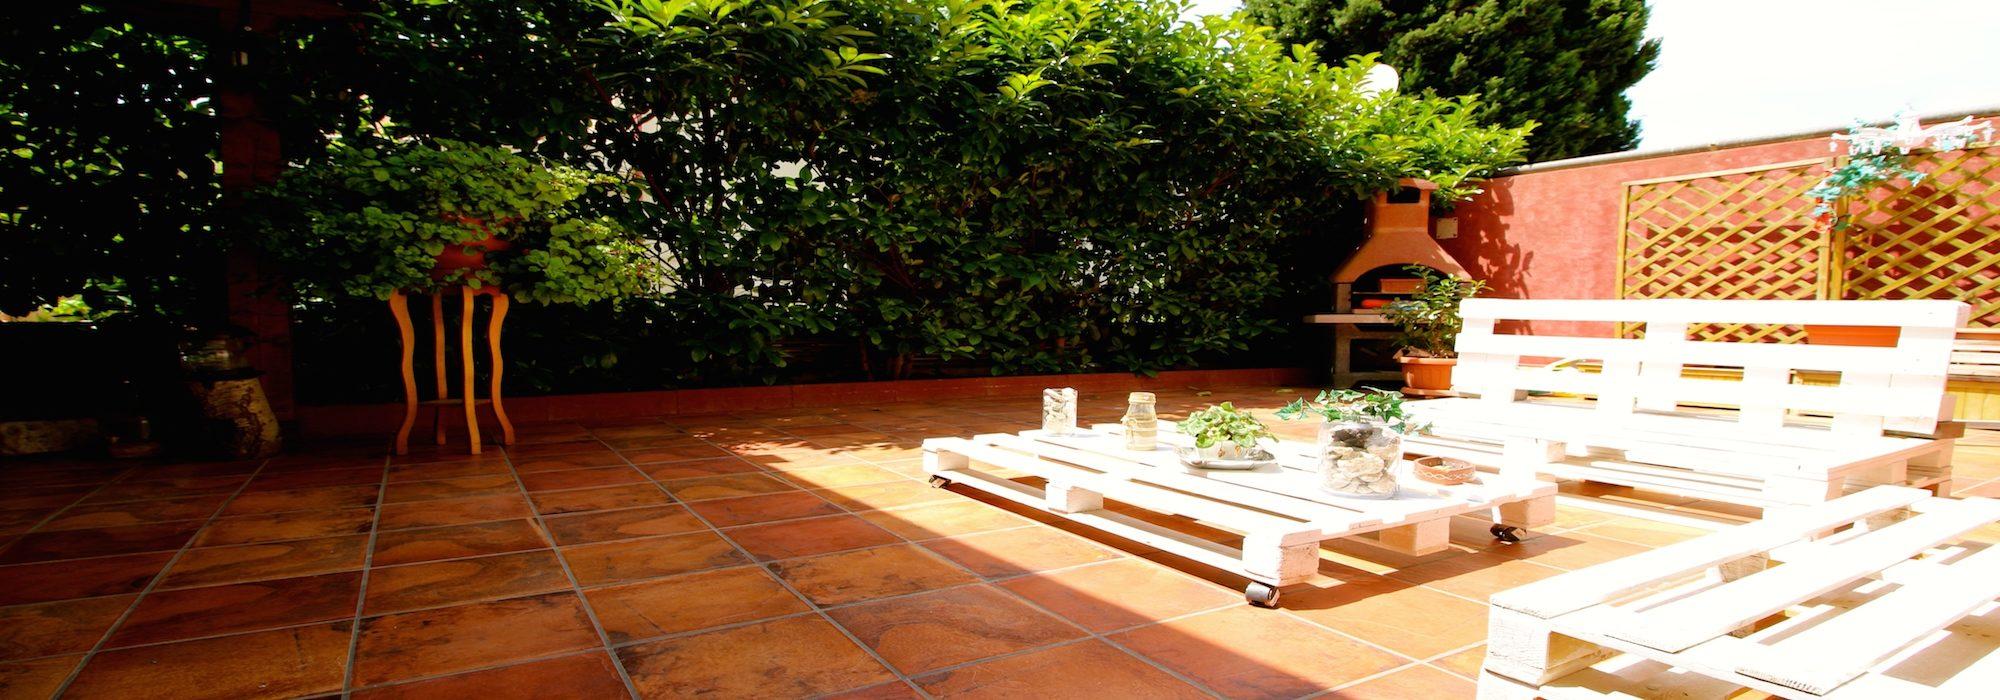 Talsano – Piano terra con giardino